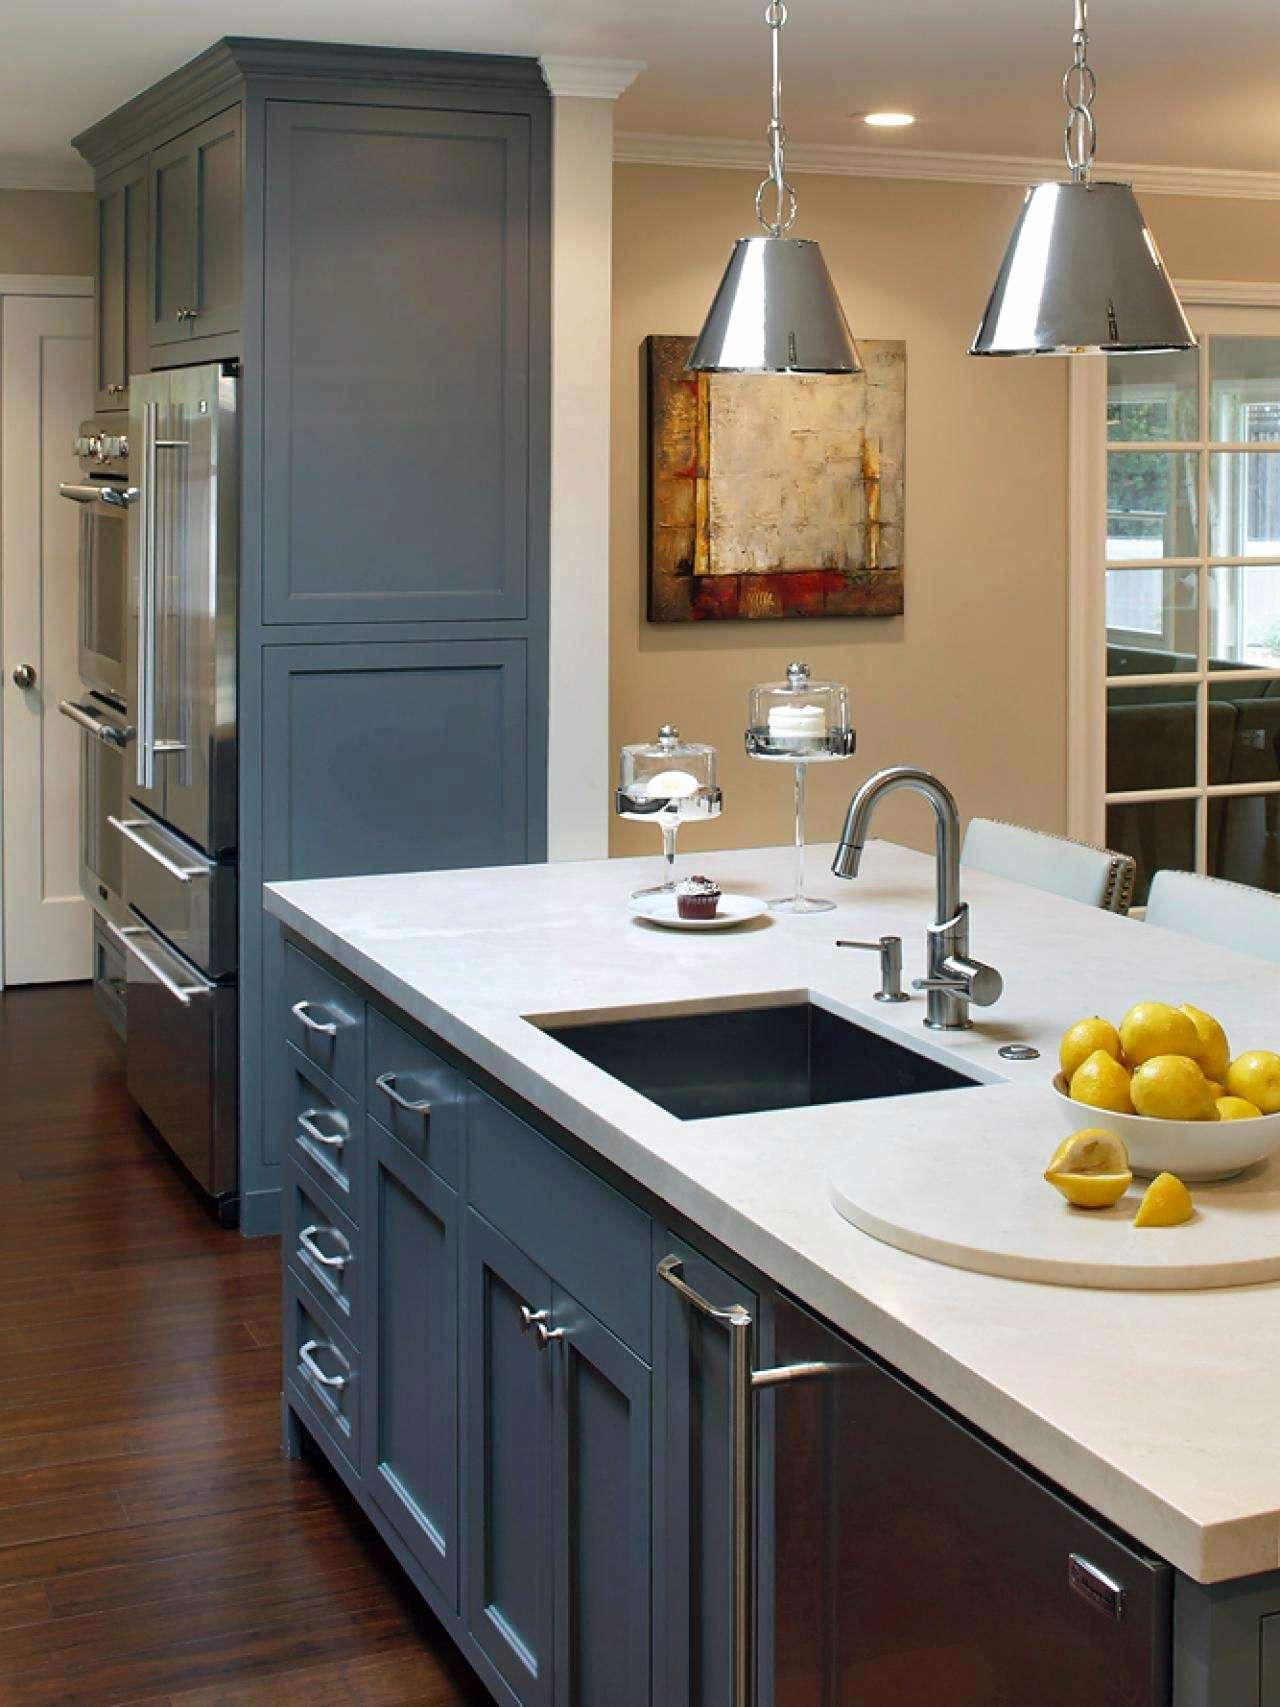 Kitchen Cabinets Wholesale Tulsa Ok New 36 New Kitchen Ideas Pic Kitchen Island With Sink Kitchen Remodel Small Kitchen Design